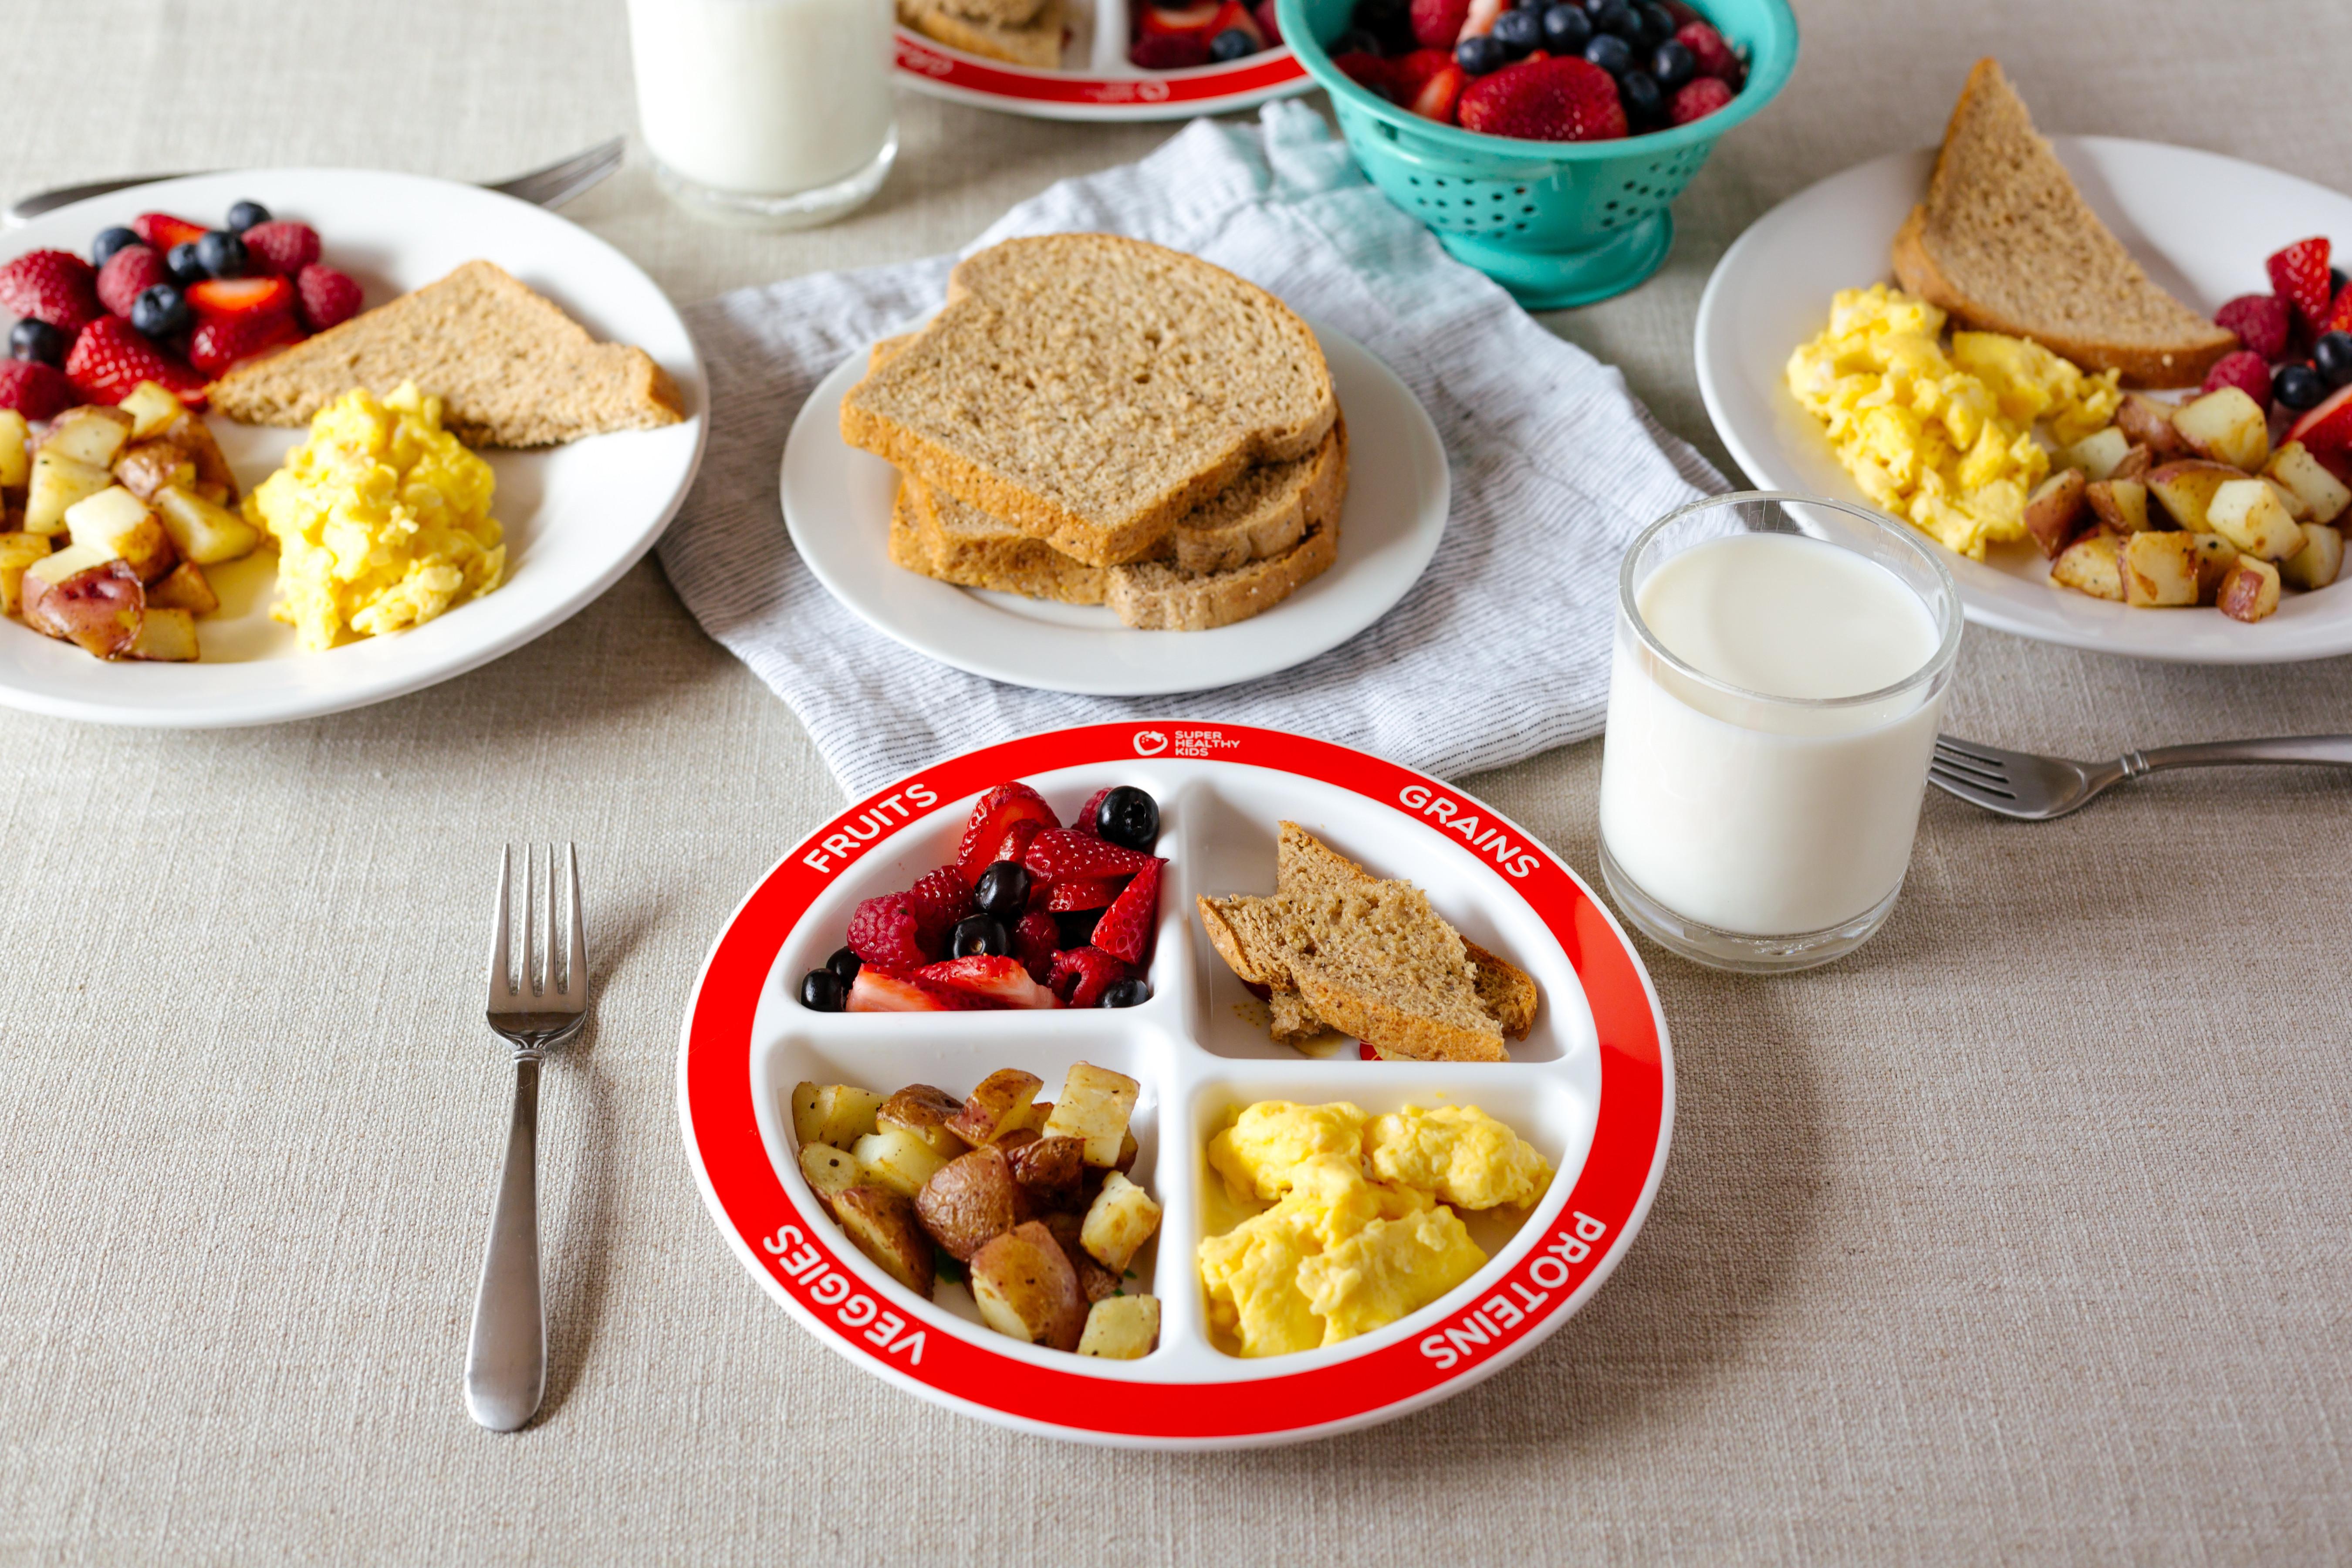 Healthy Breakfast Ideas For Kids  Healthy Balanced Breakfast with MyPlate